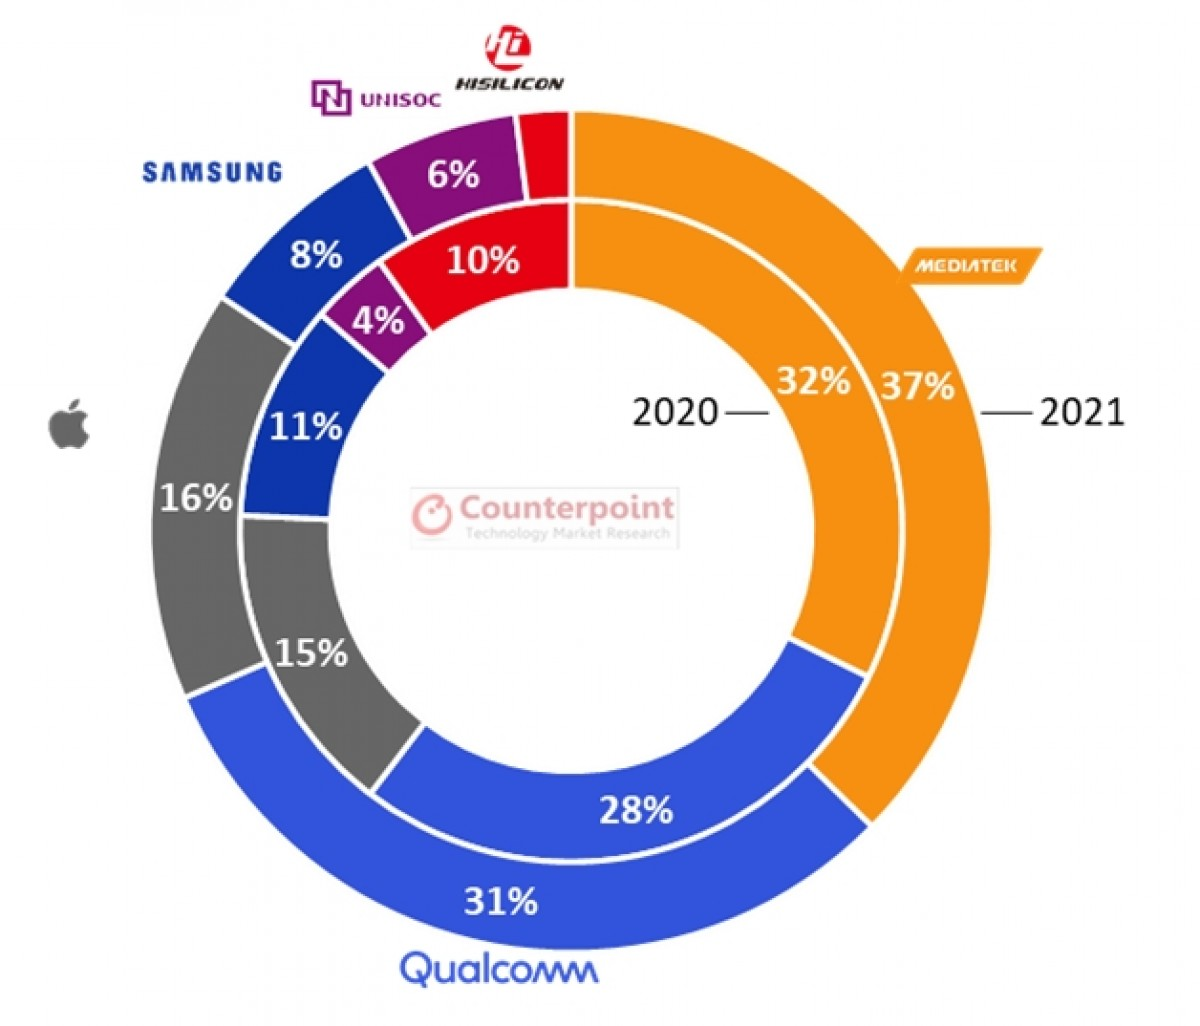 Global smartphone SoC market share